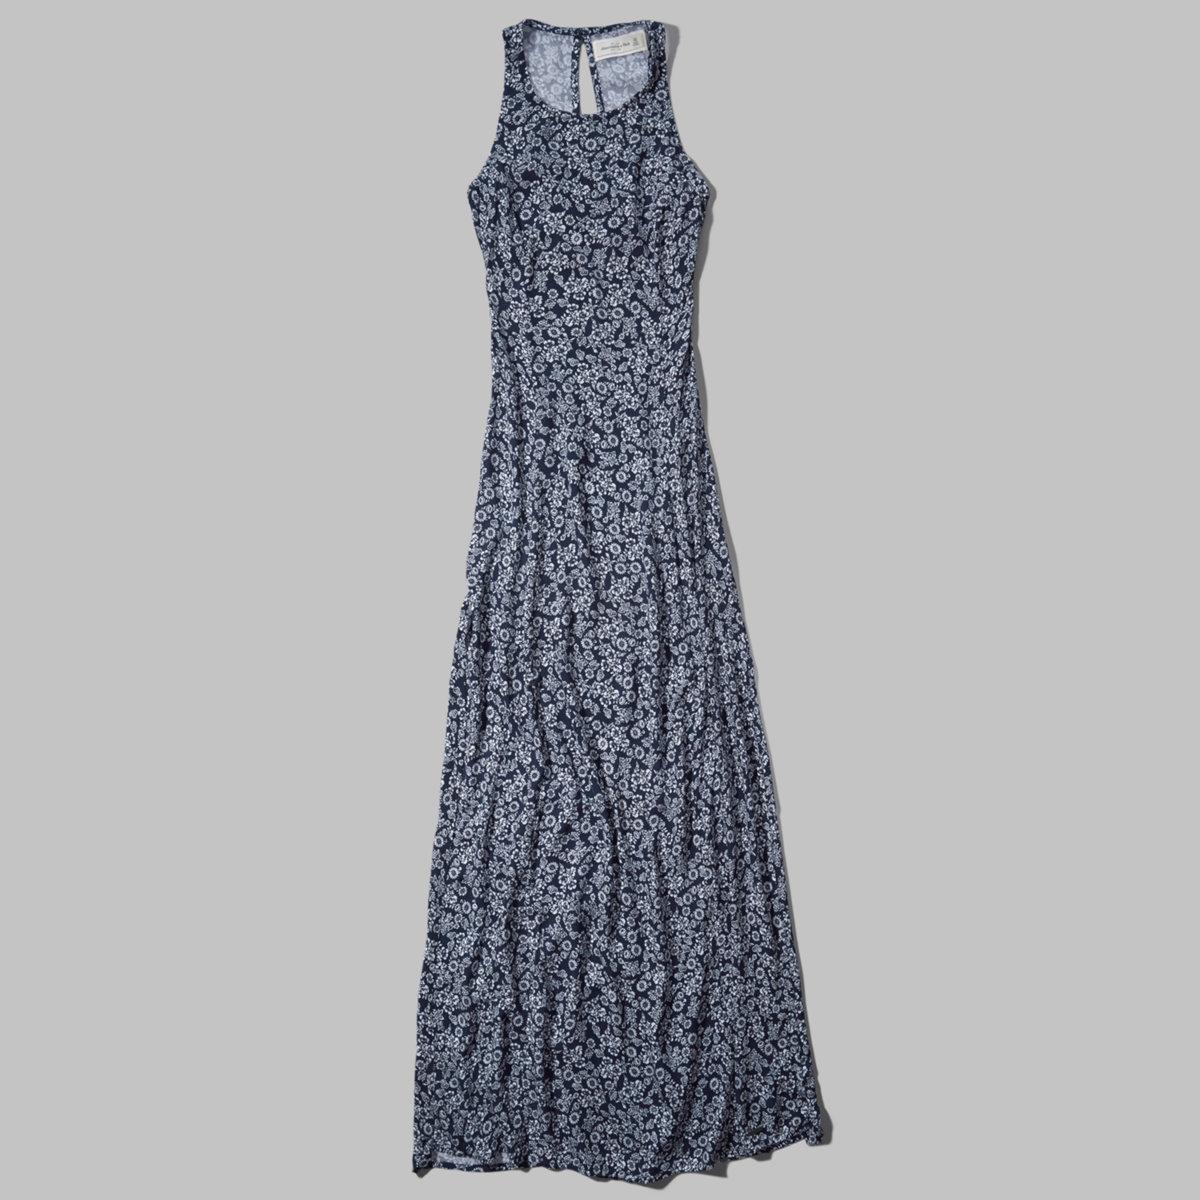 Codie Maxi Dress